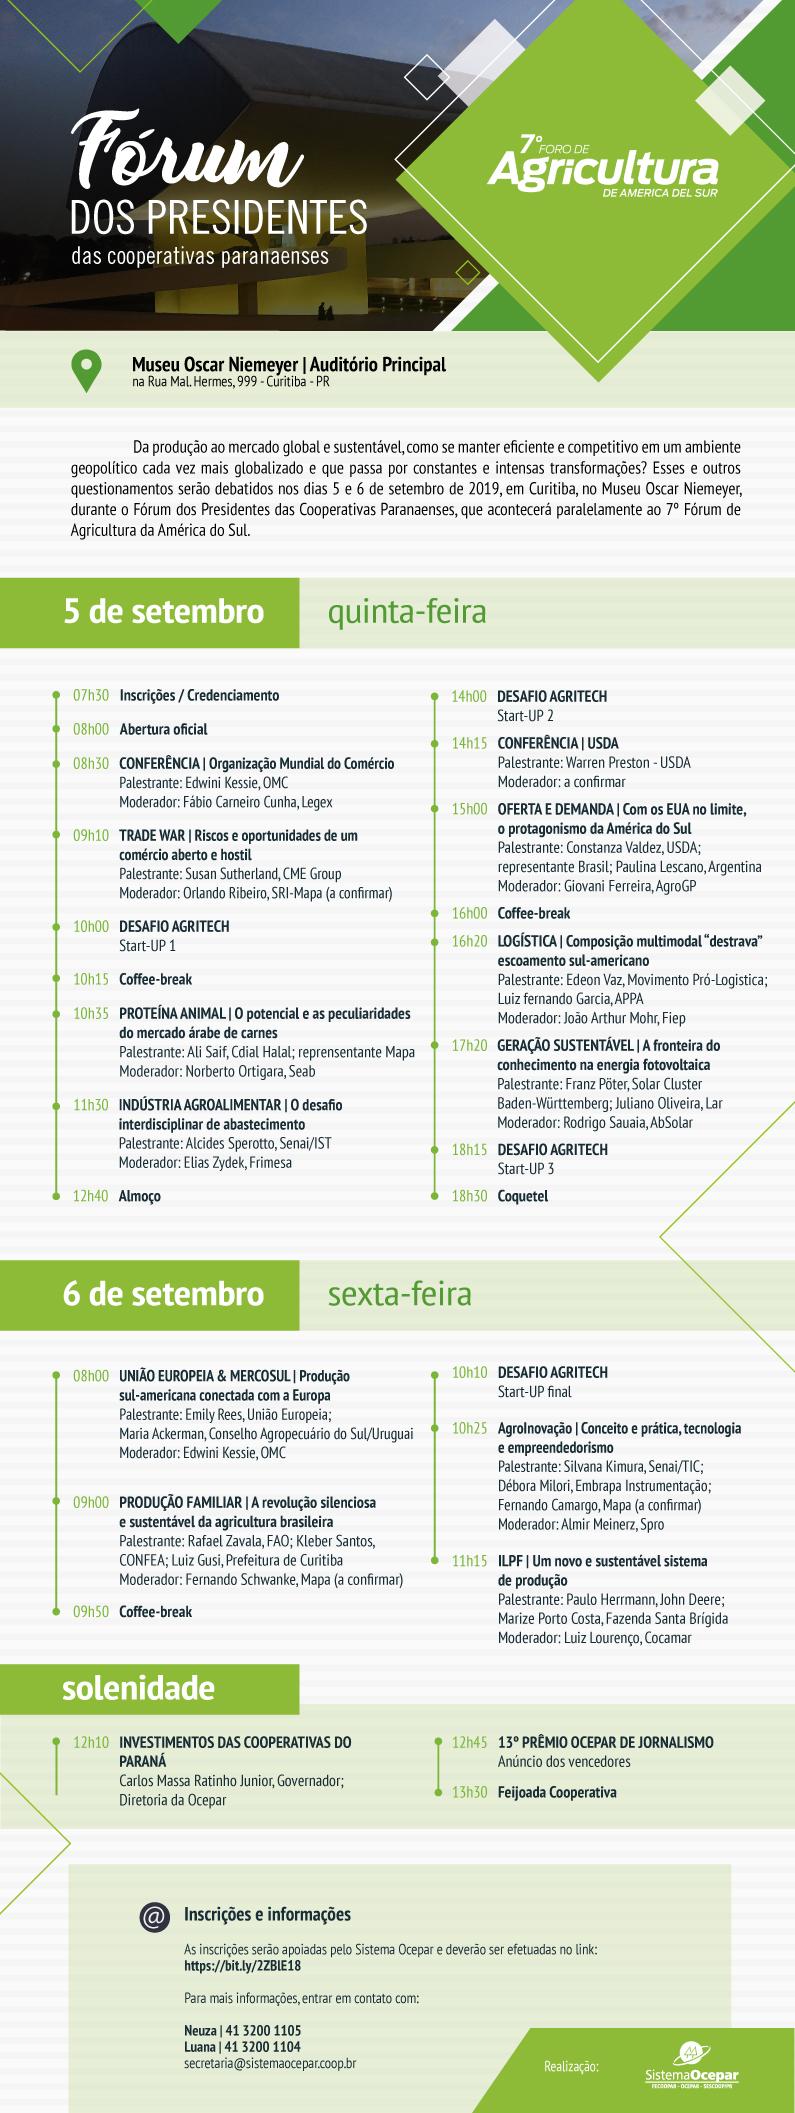 forum presidentes cartaz 28 08 2019jpg